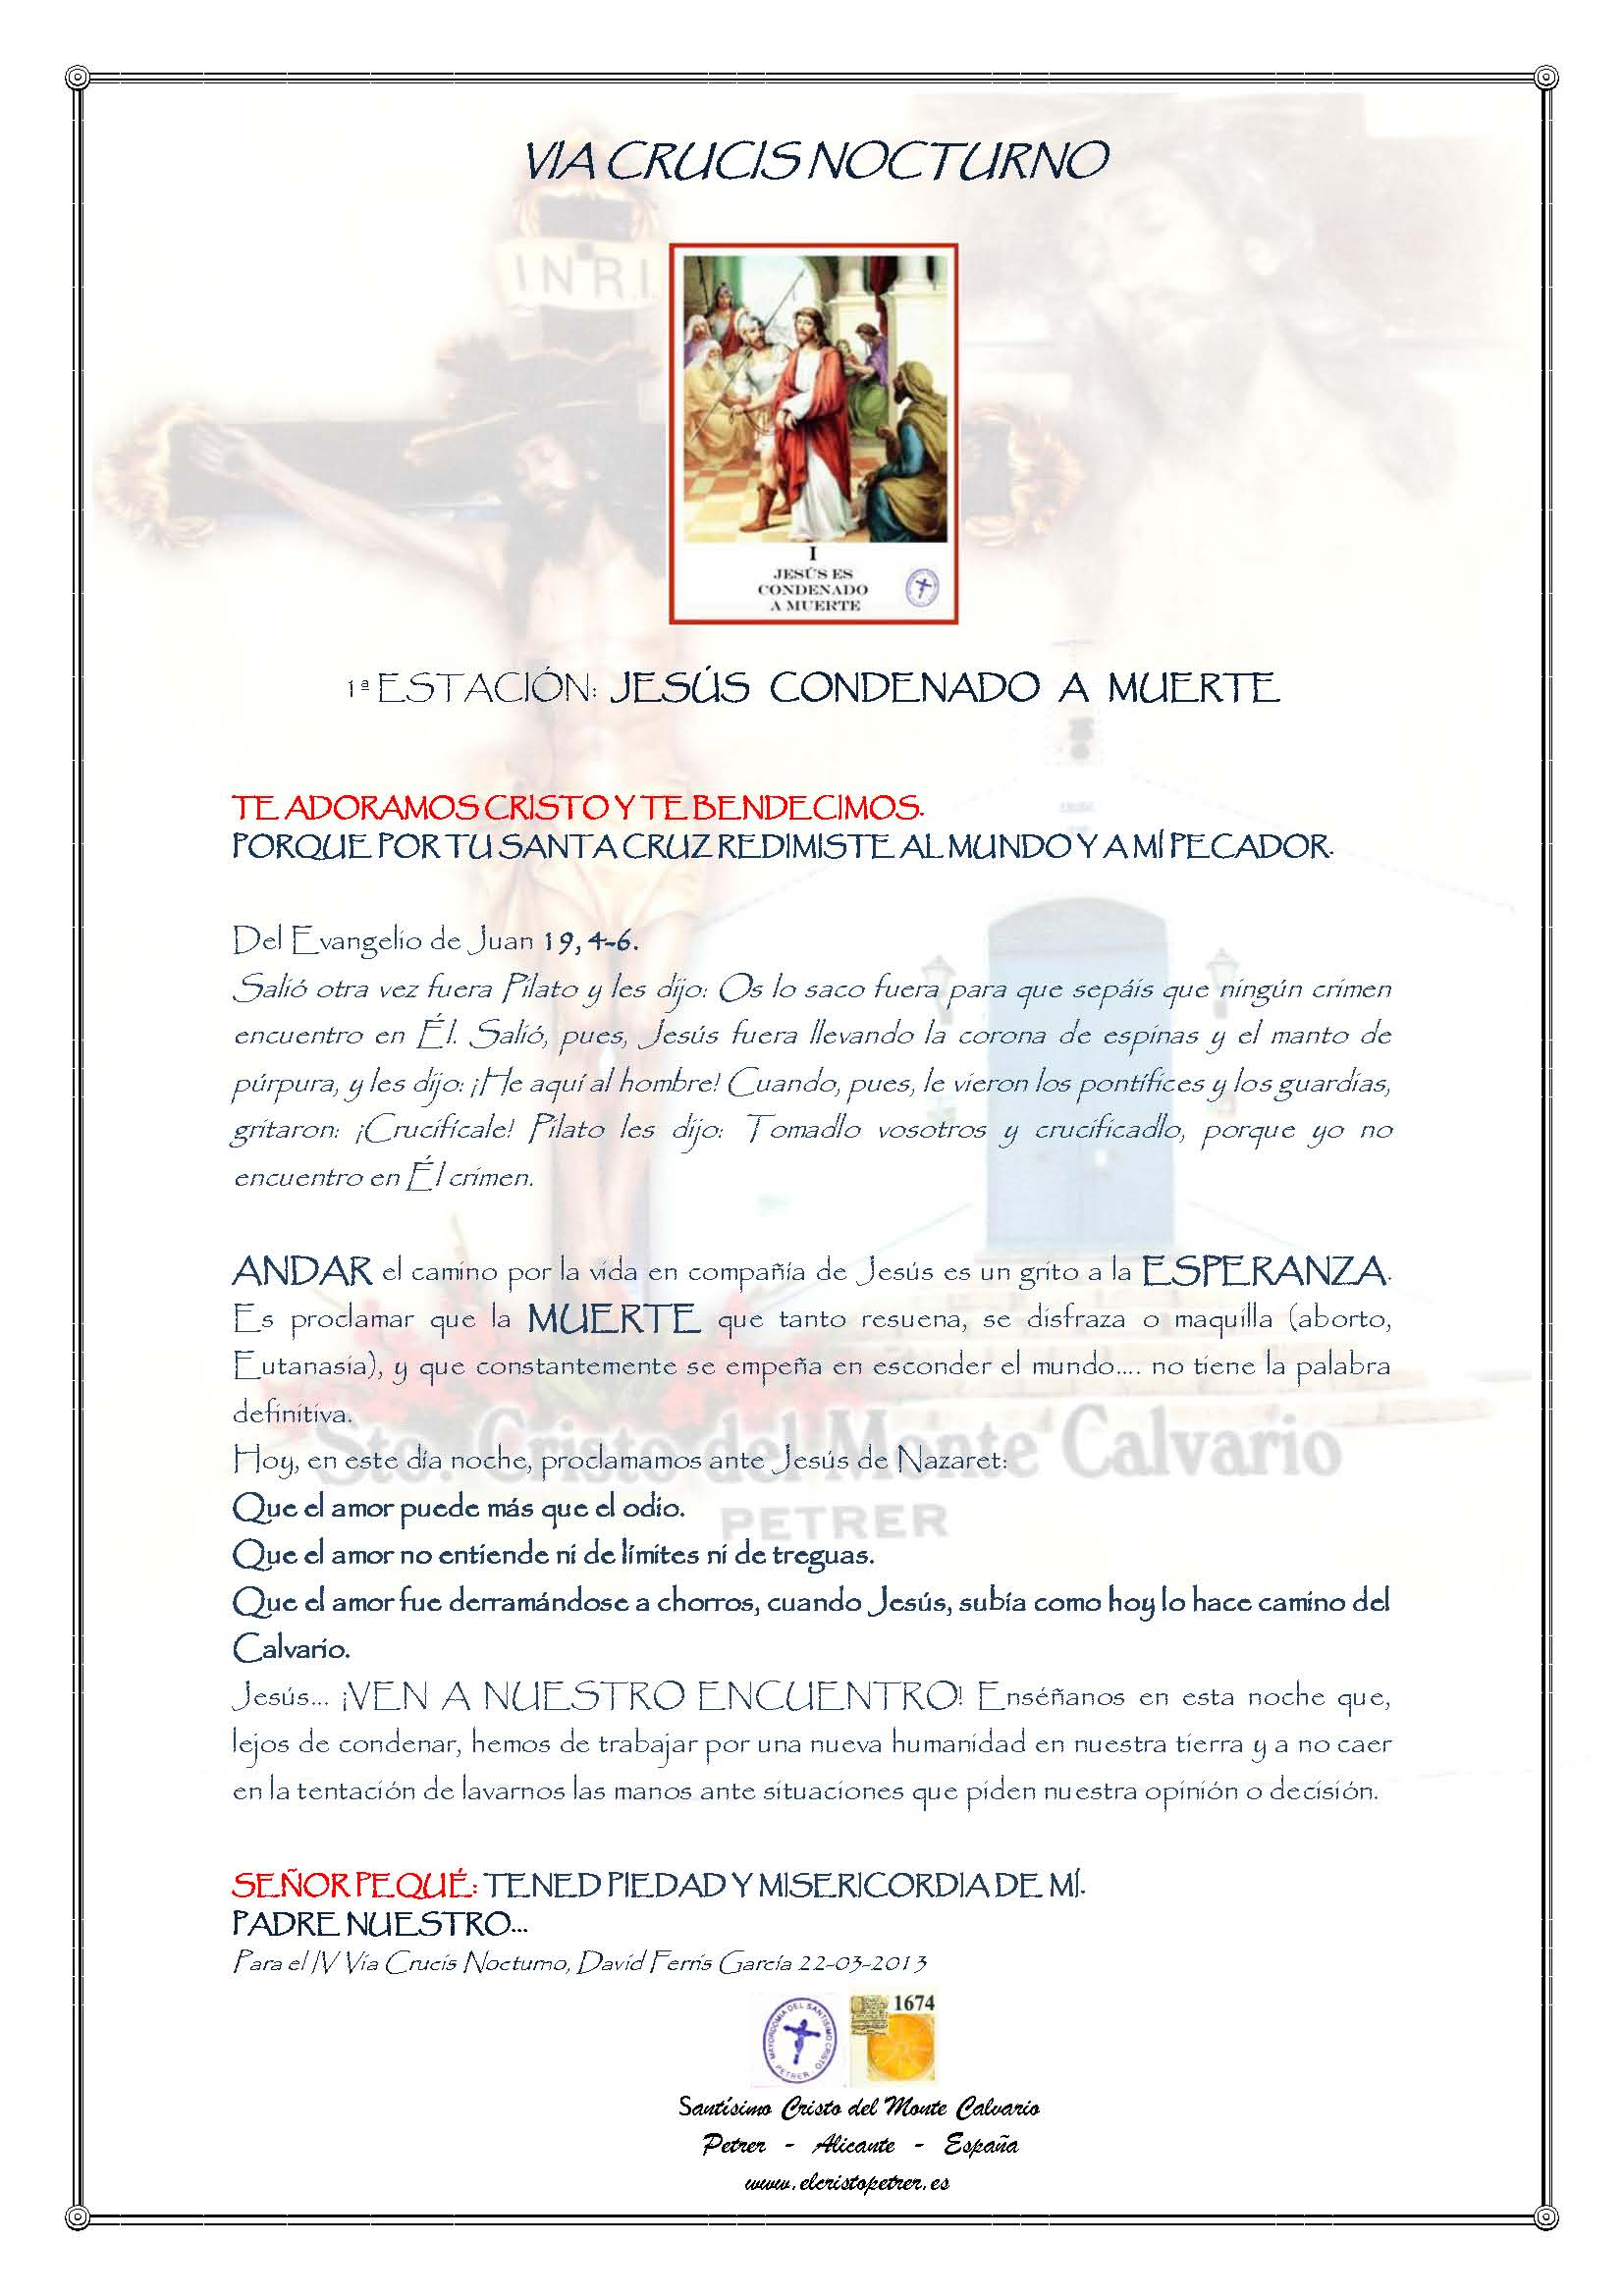 ElCristo - Oraciones - Iglesia - Iglesia - VIA CRUCIS NOCTURNO_Página_01